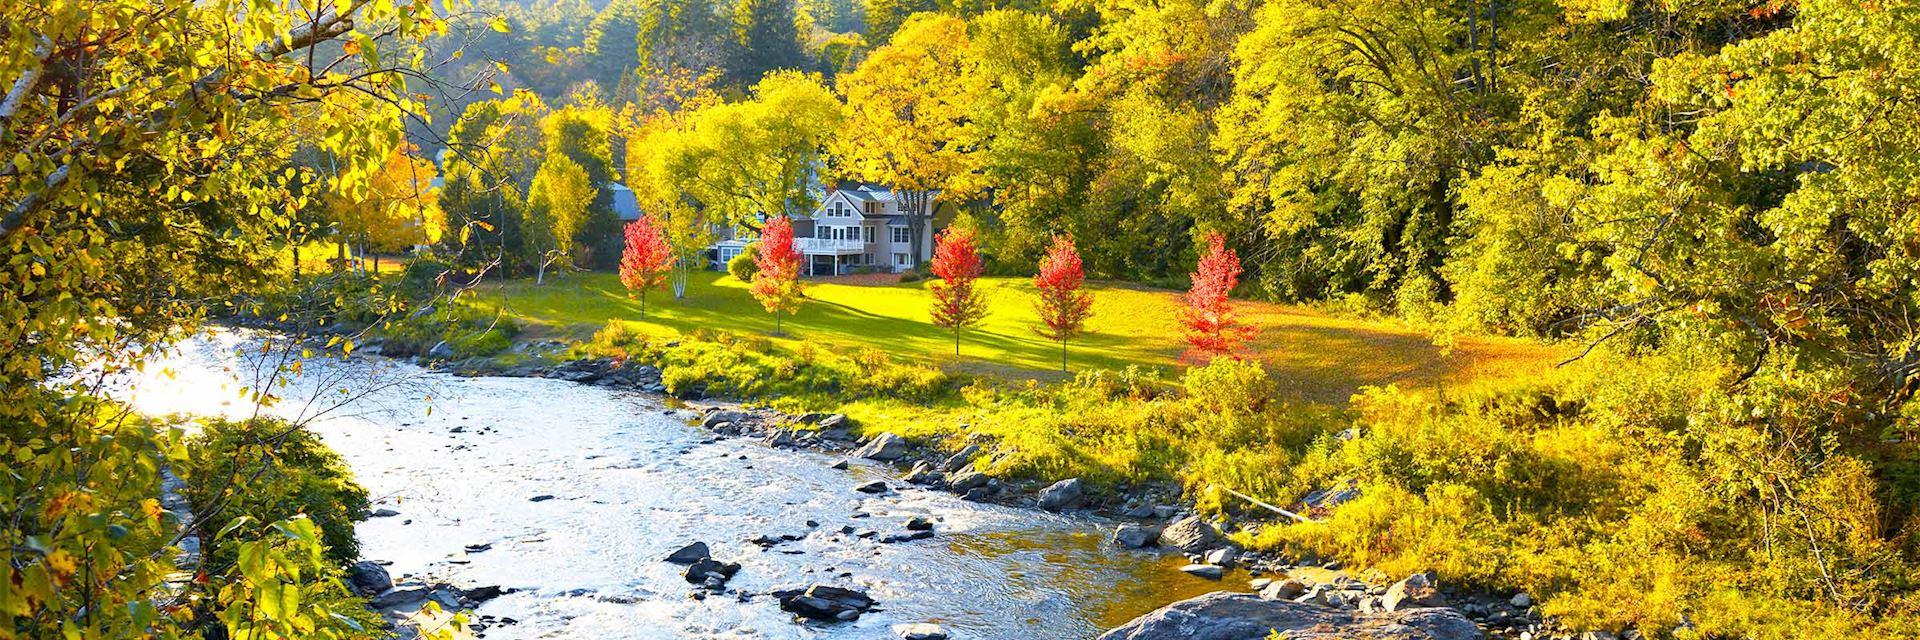 Ottauquechee River in Woodstock, Vermont